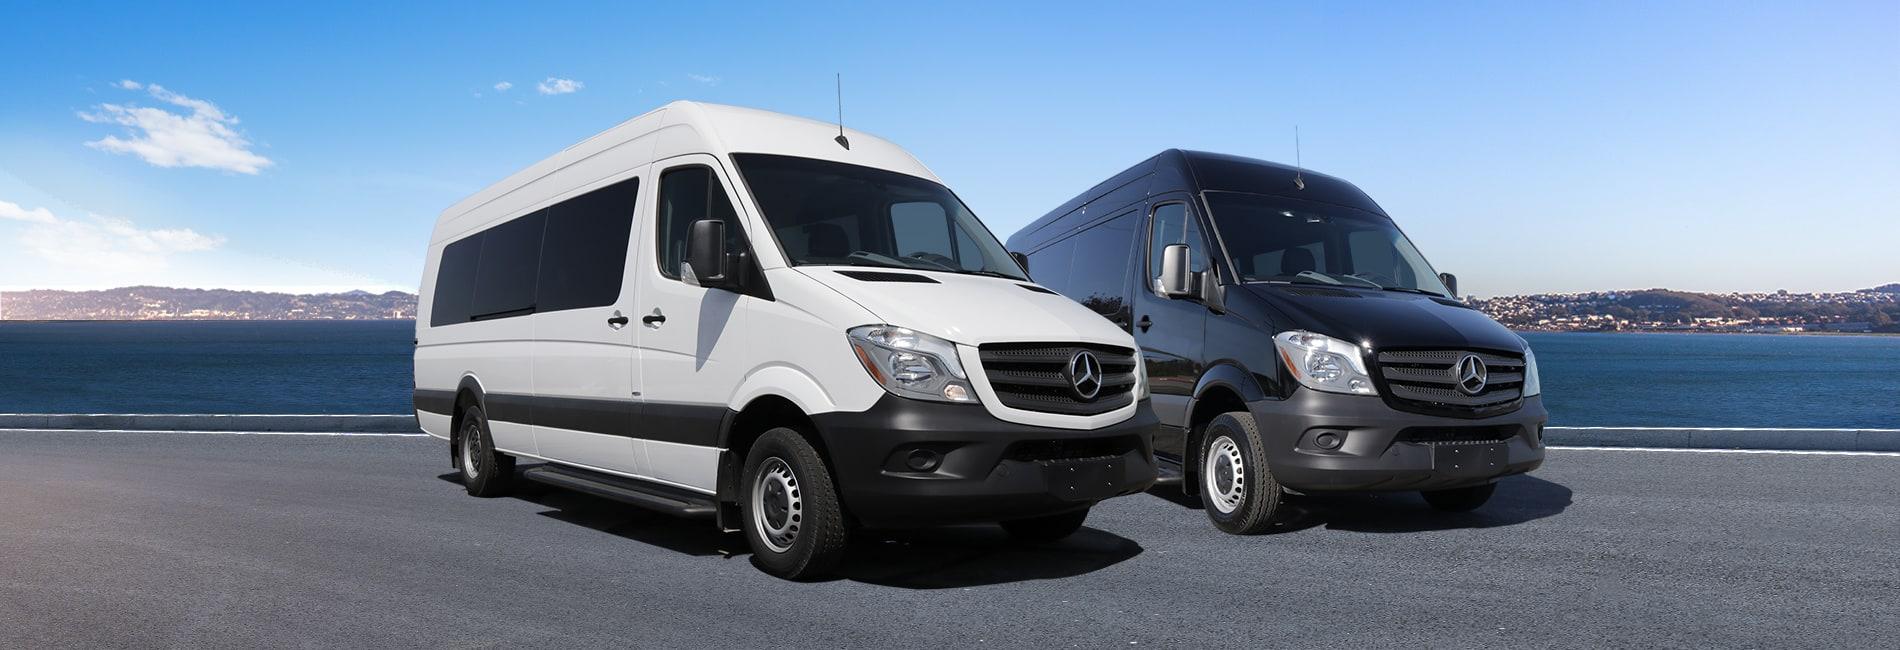 Smartliner Mercedes Benz Sprinter 3500 Chassis | Creative Bus Sales